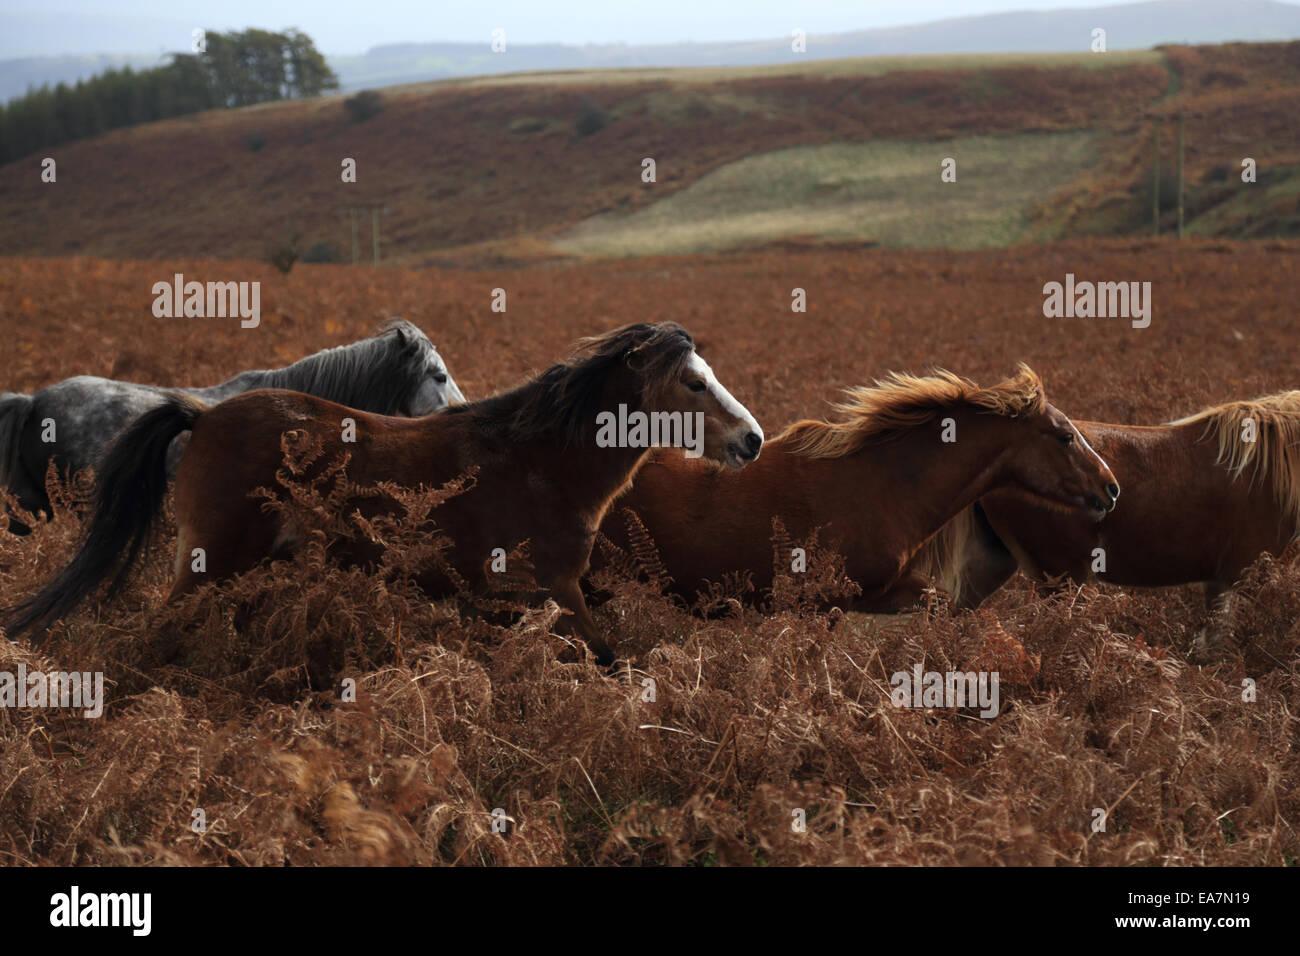 Wild Welsh ponies running in a herd across the Rhulen Hills near Builth Wells, Wales, UK - Stock Image